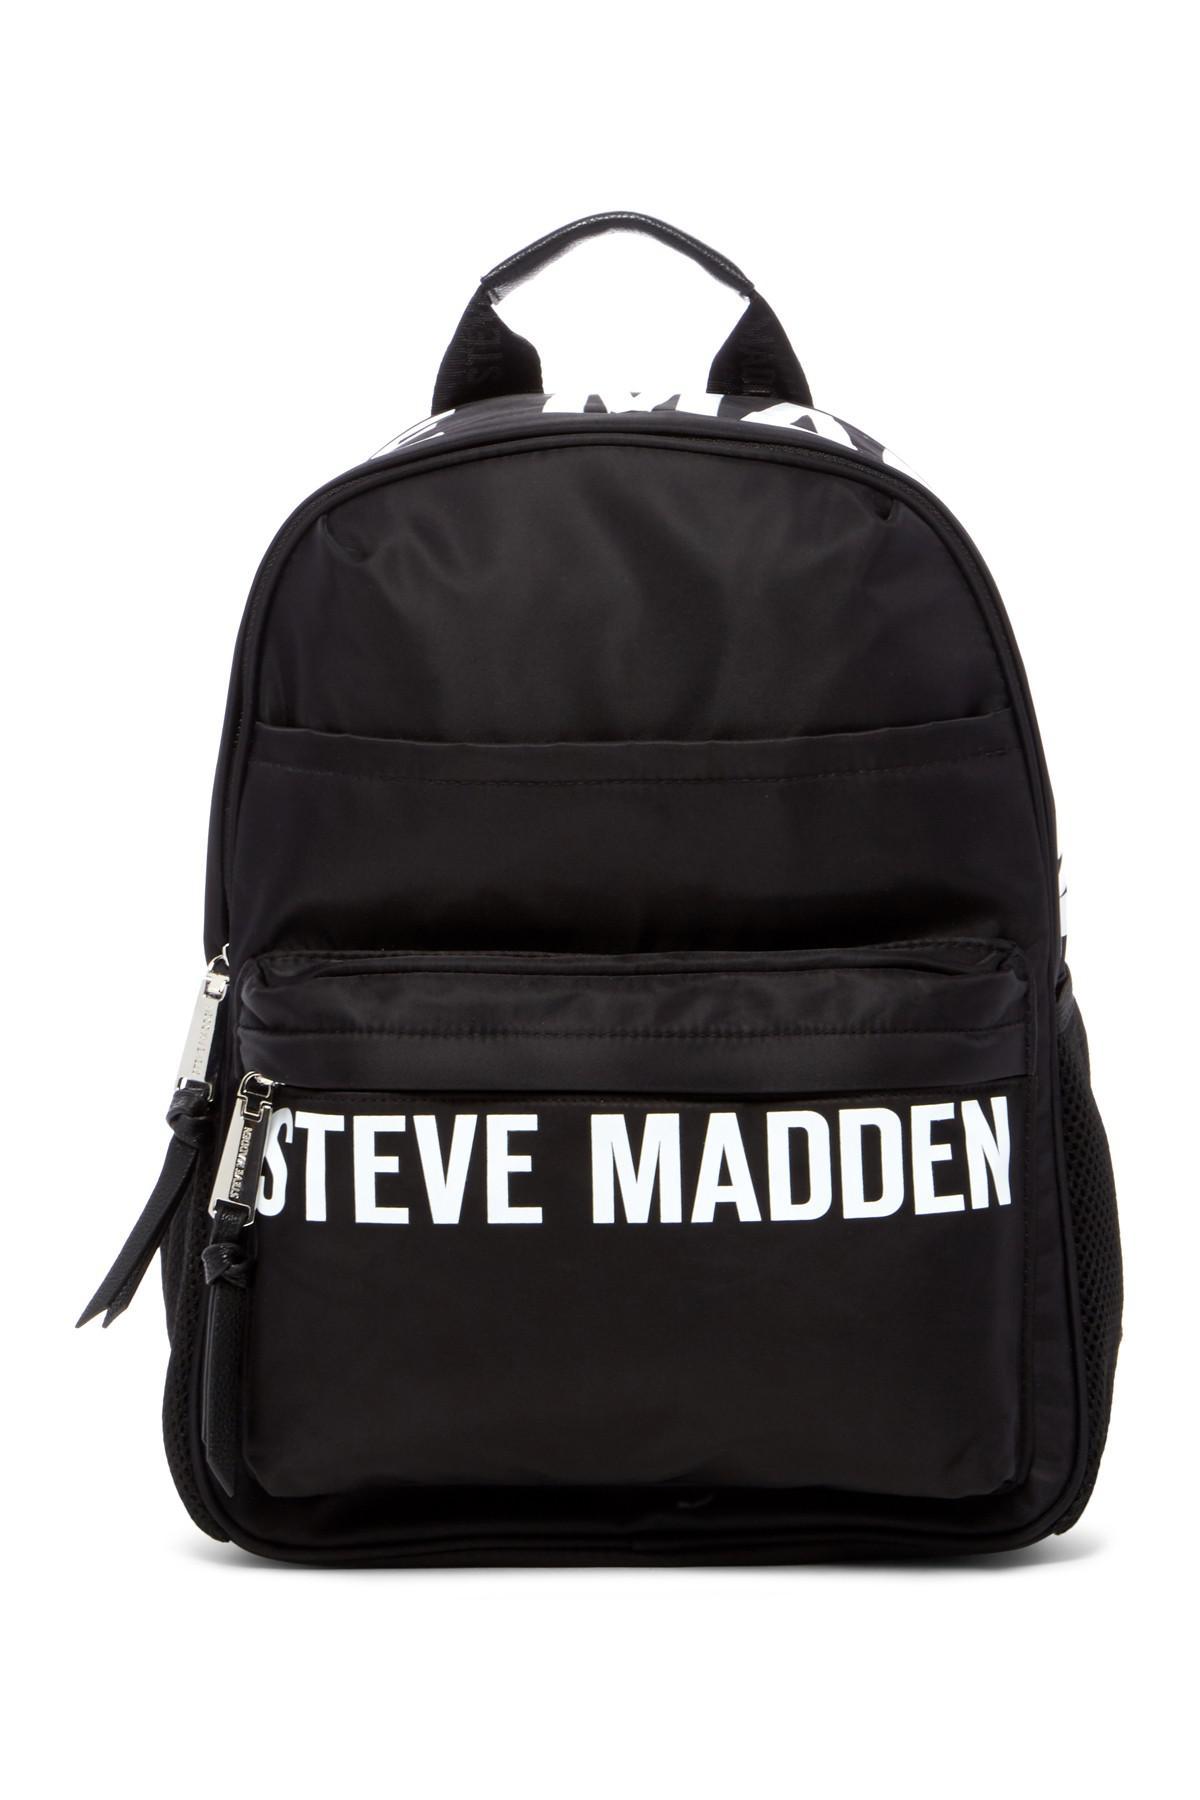 Steve Madden Placement Print Nylon Backpack In Black Lyst